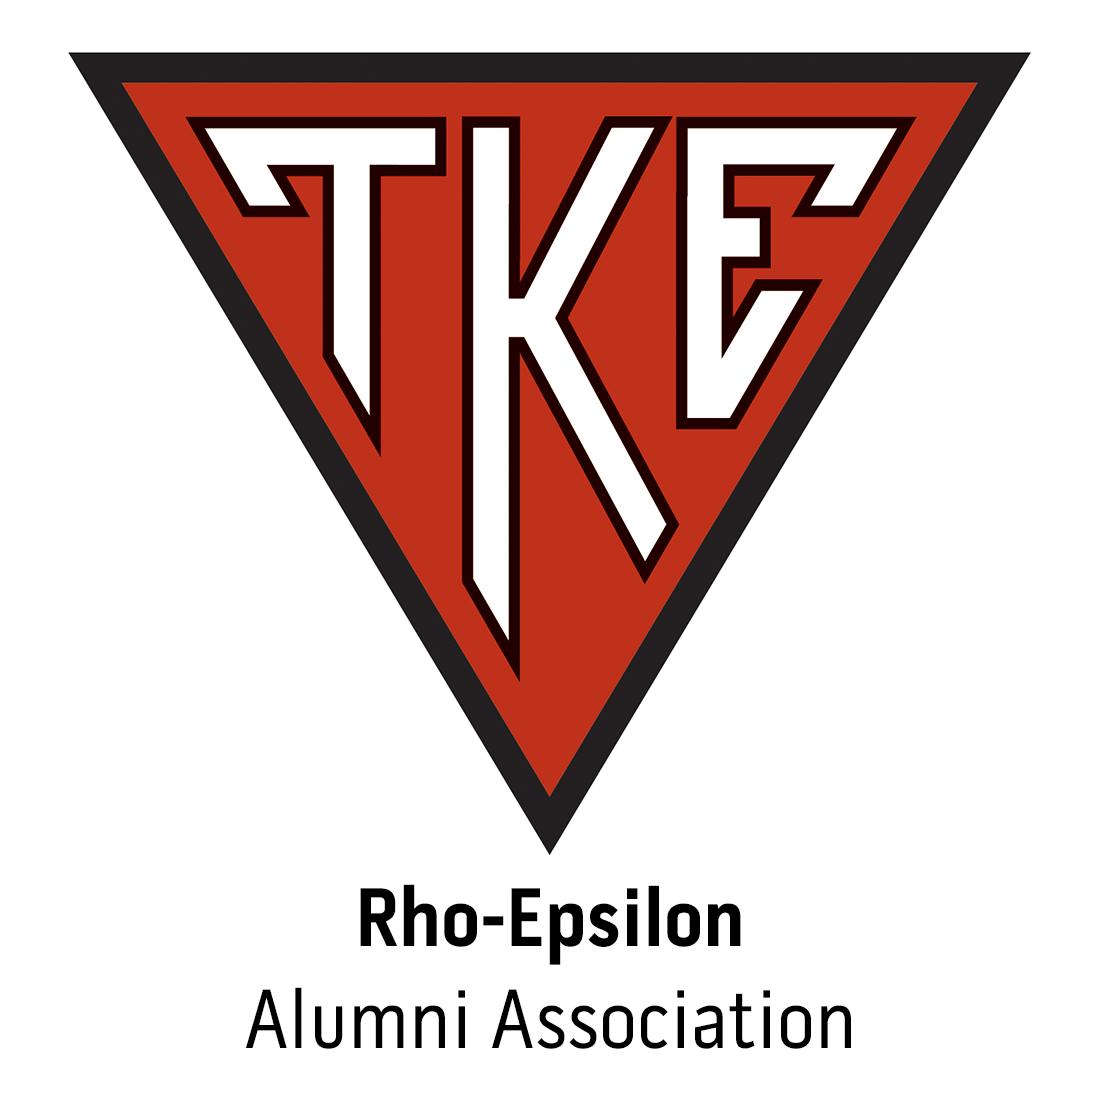 Rho-Epsilon Alumni Association at Northwood University